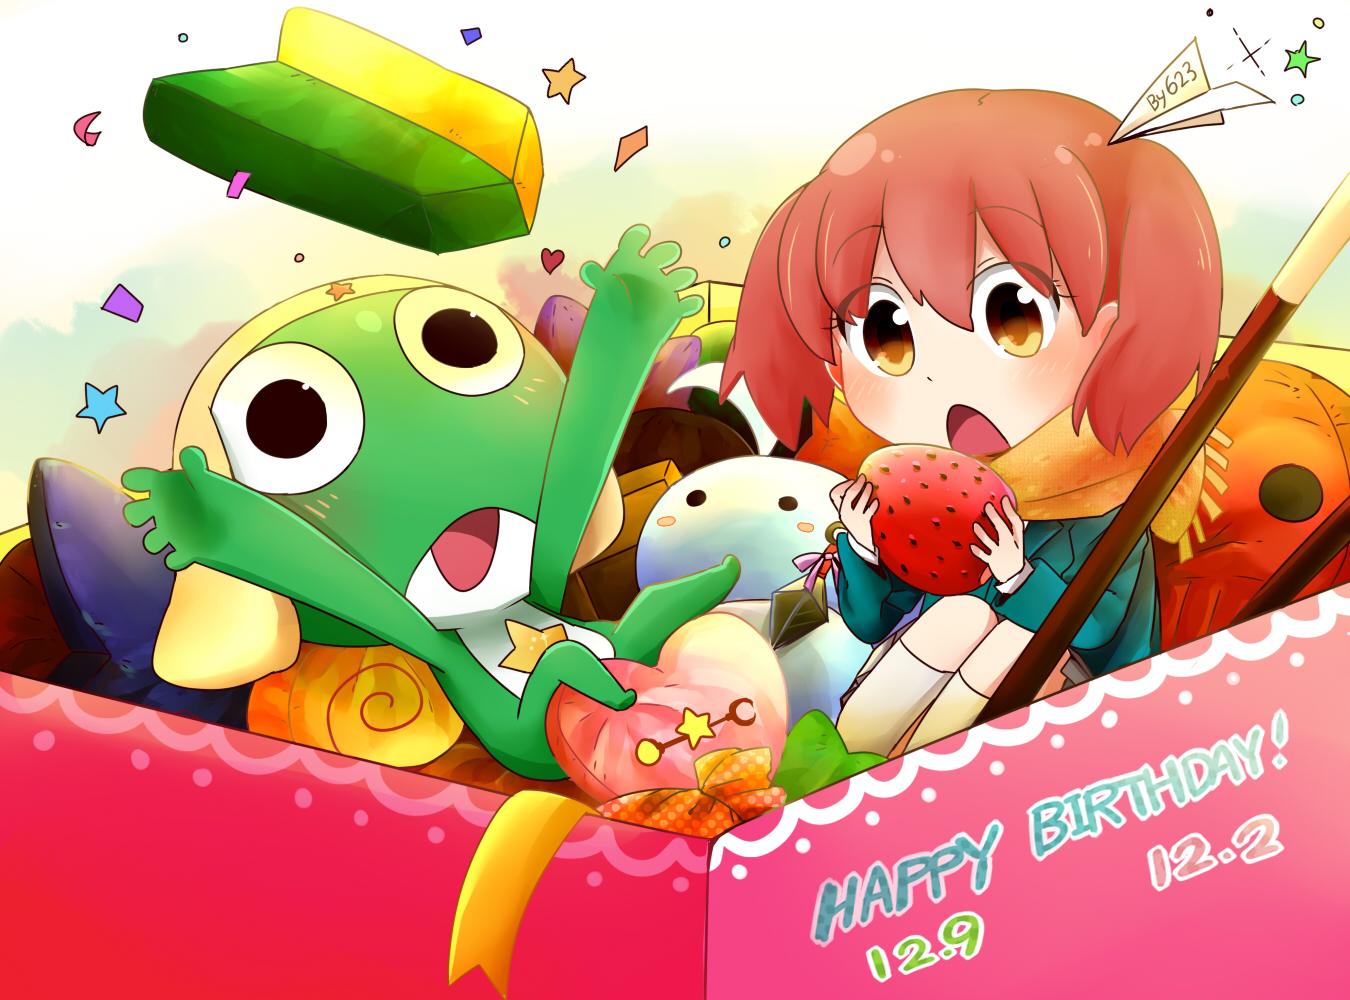 anime_wallpaper_keroro-2853029-47485307_p0.jpg